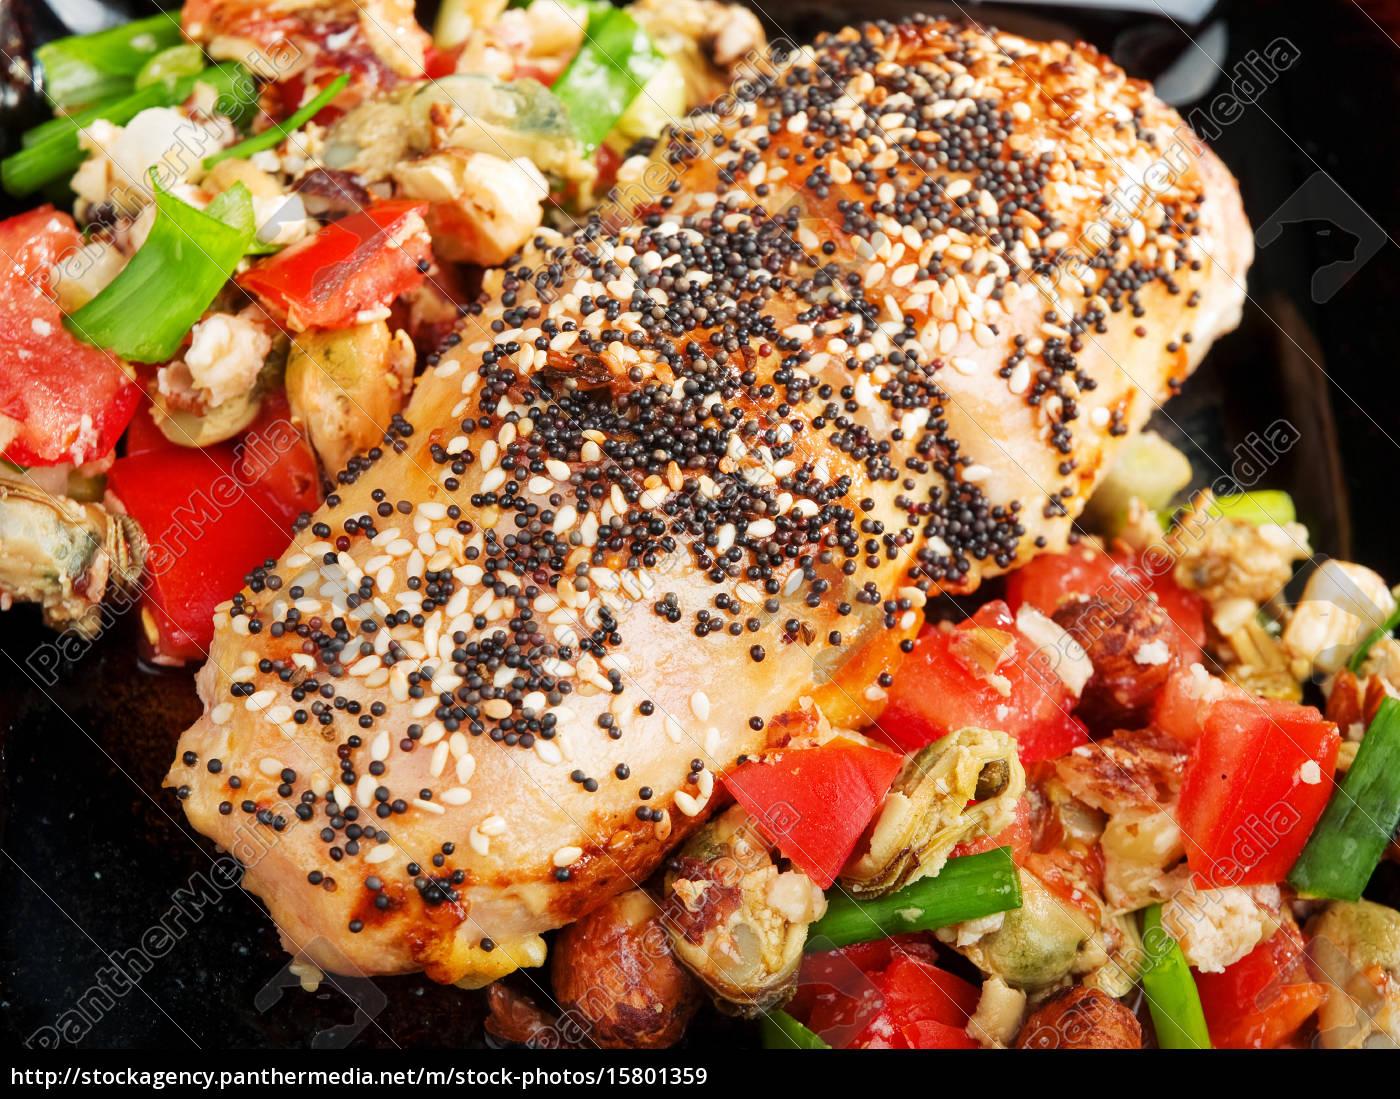 stuffed, chicken, with, salsa, stuffed, chicken, with - 15801359